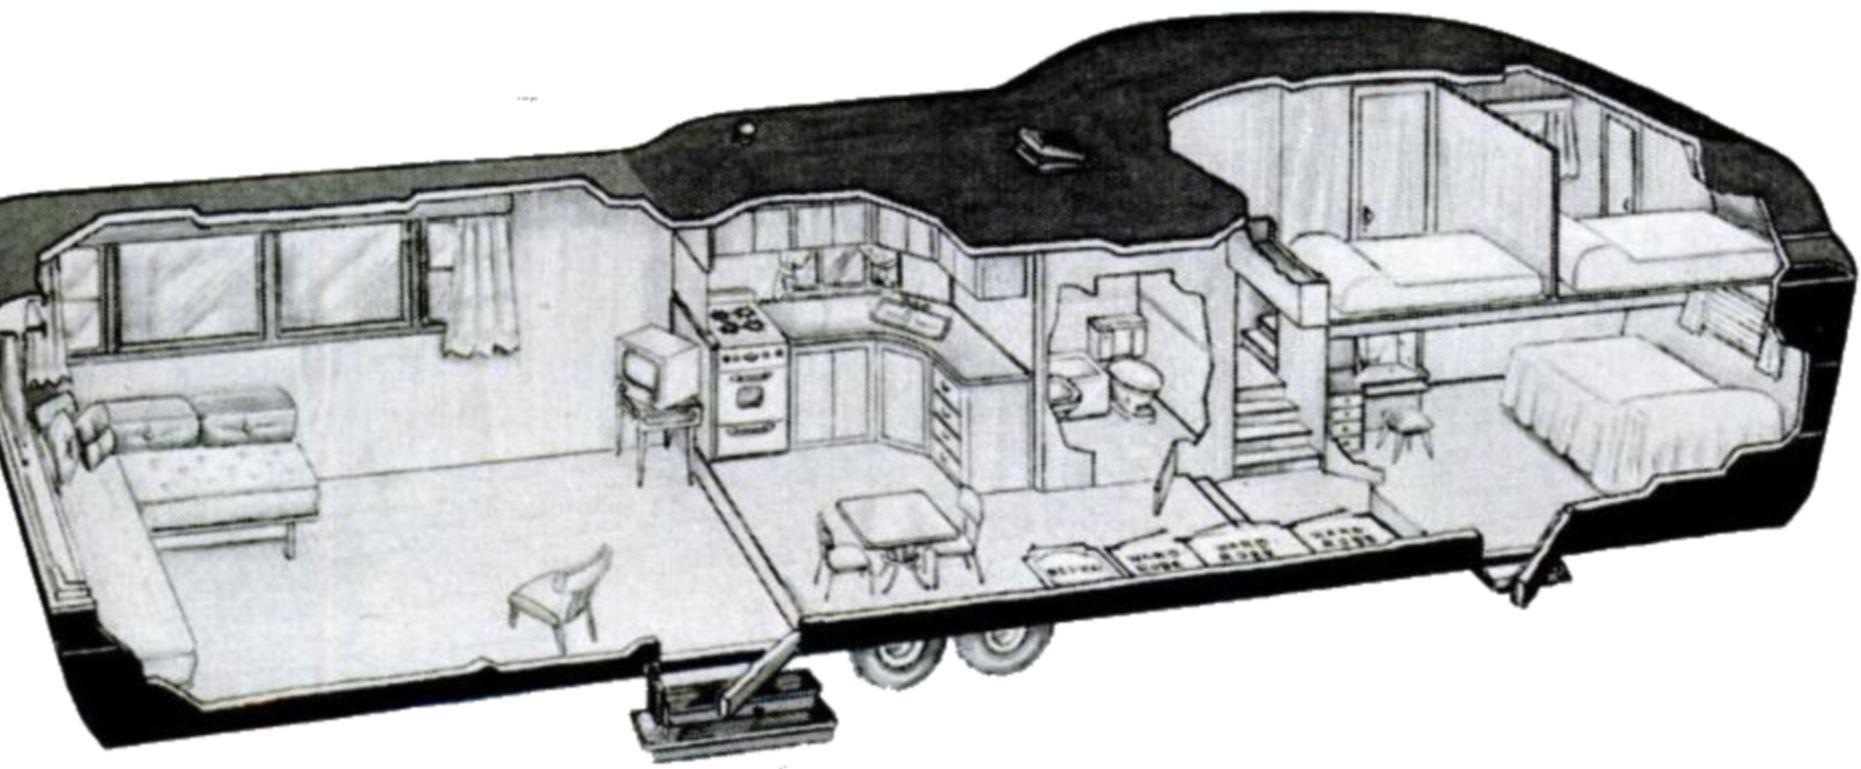 Two Story Trailer Cutway, 1952 Travel trailer floor